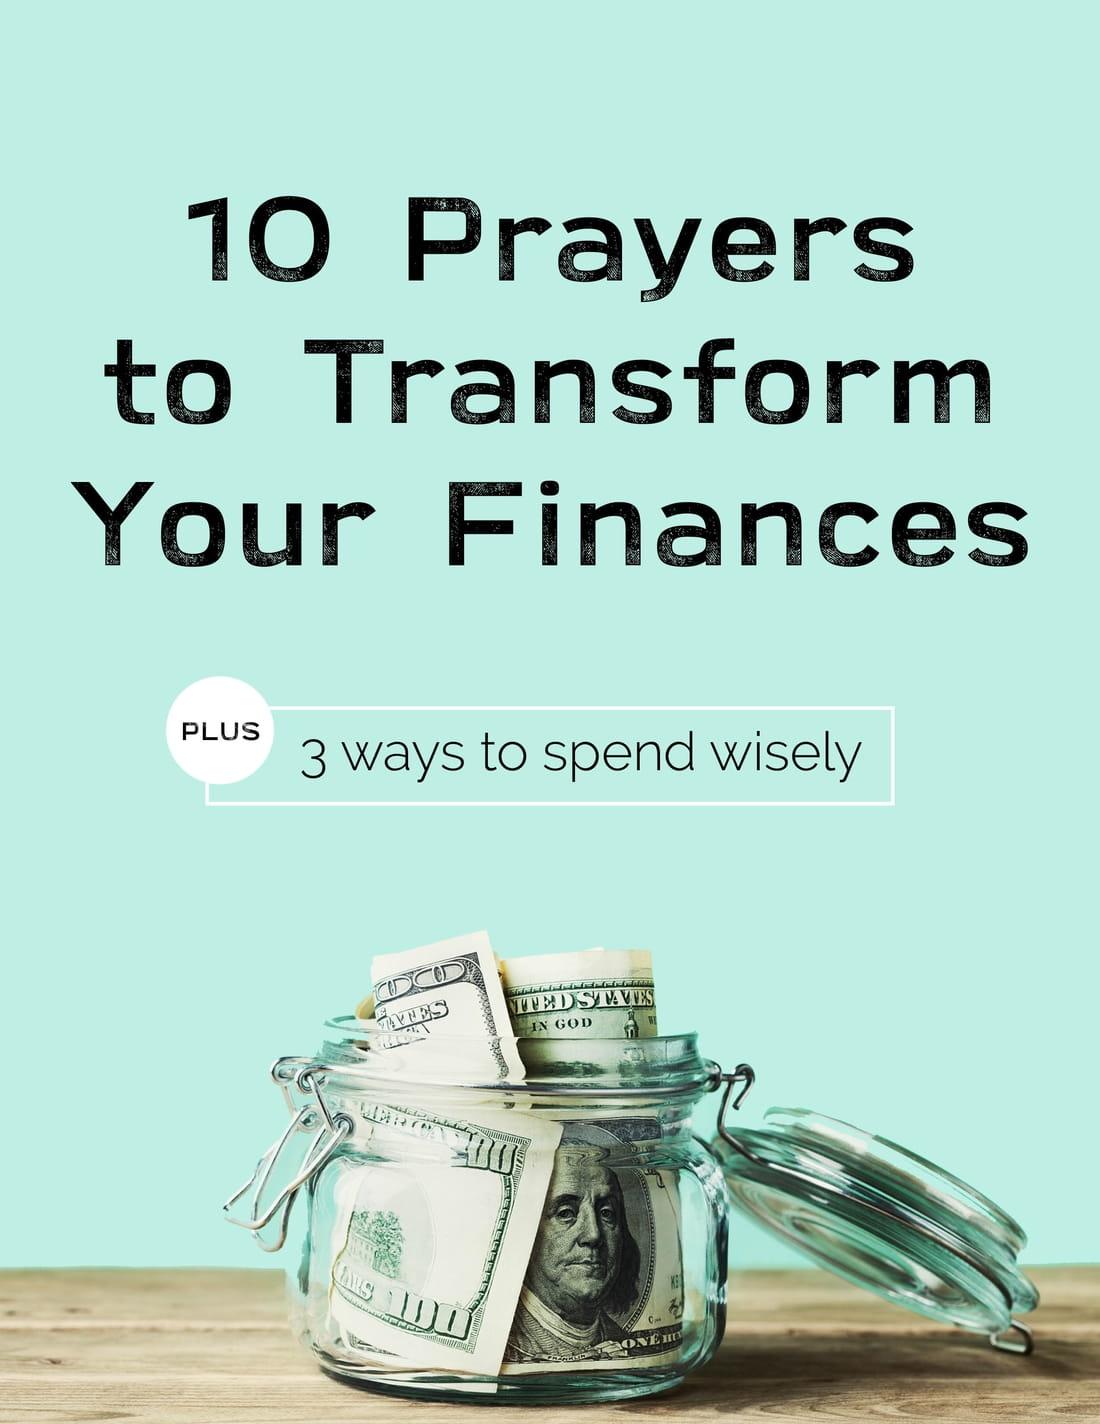 10 Prayers to Transform Your Finances